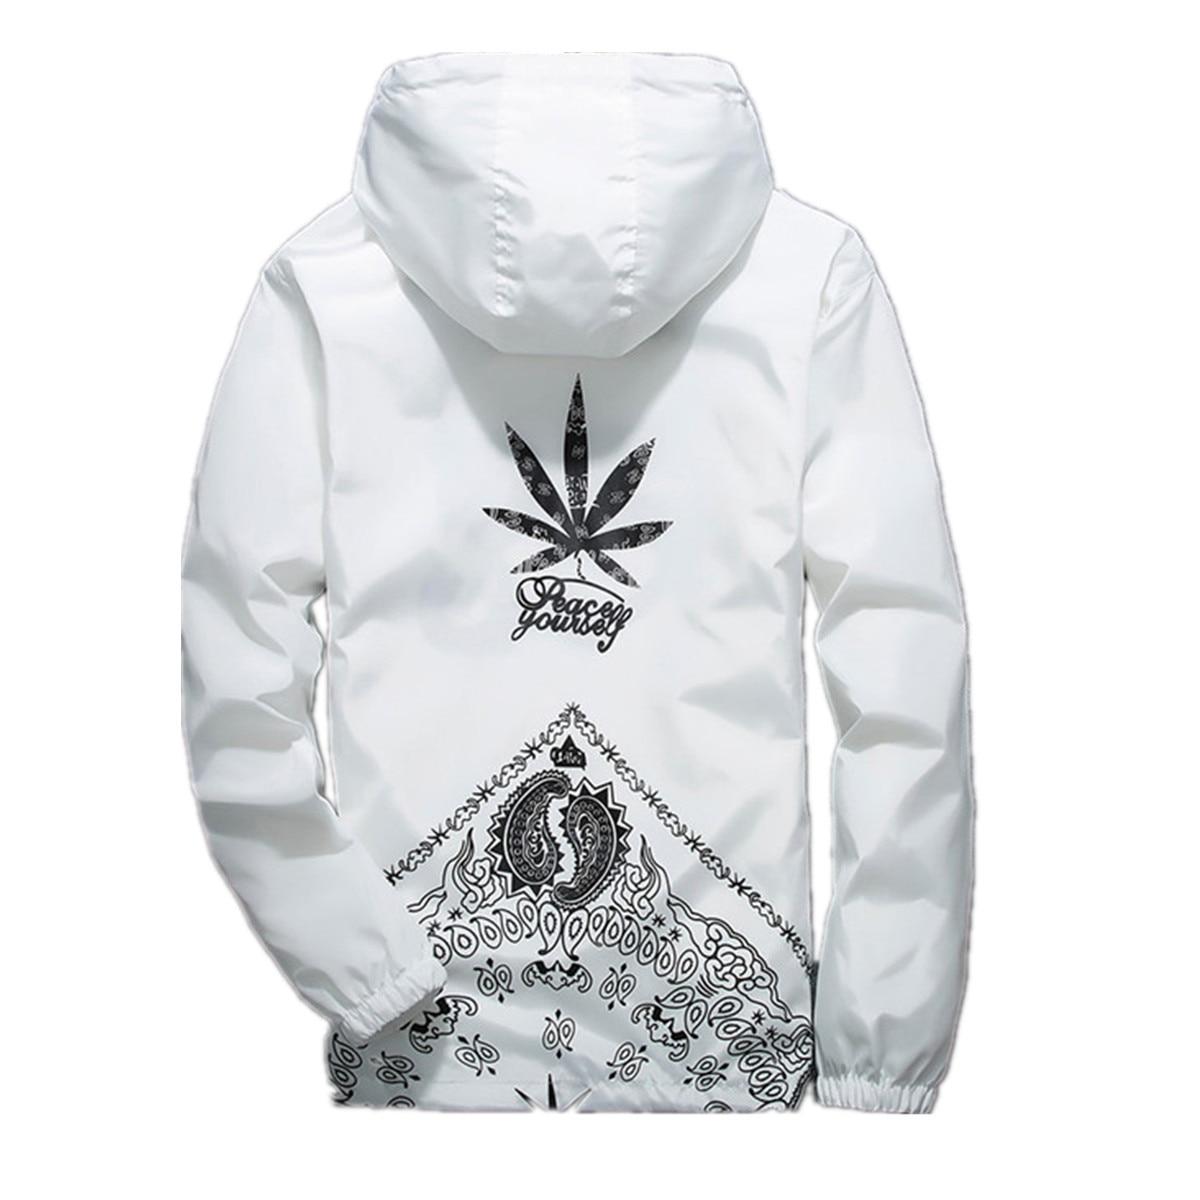 New Arrival Spring Summer WINDBREAKERS Jacket Mens Jackets Mens Jacket Hip Hop Coats Streetwear US Size M L XL XXL